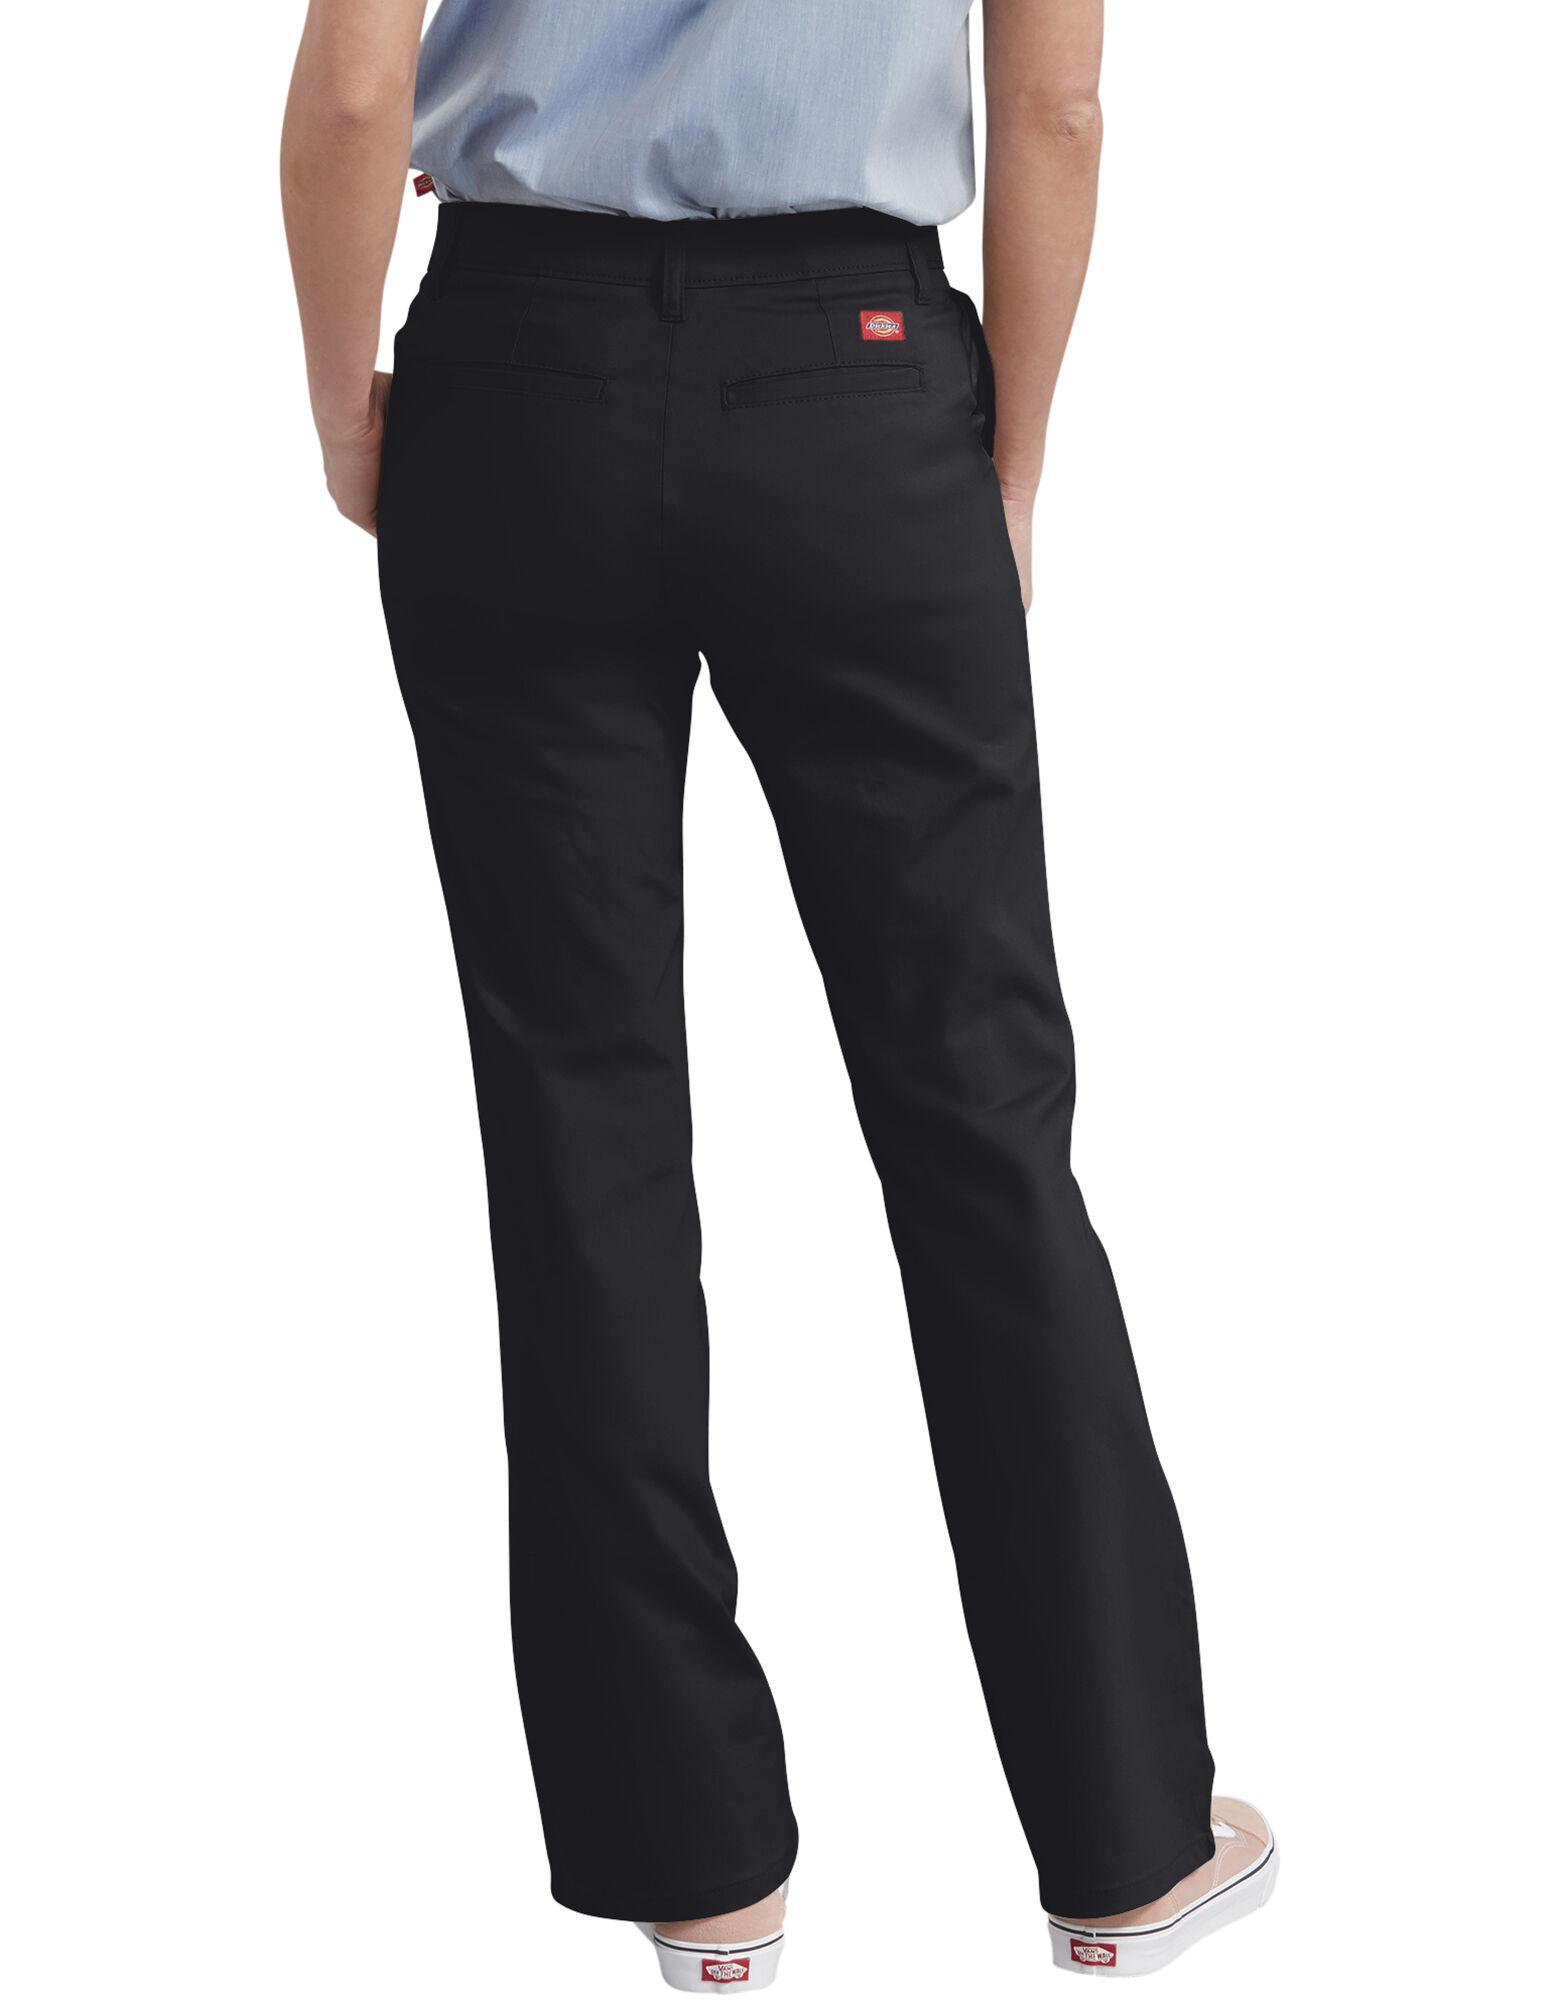 Women's Slim Fit Boot Cut Stretch Twill Pant